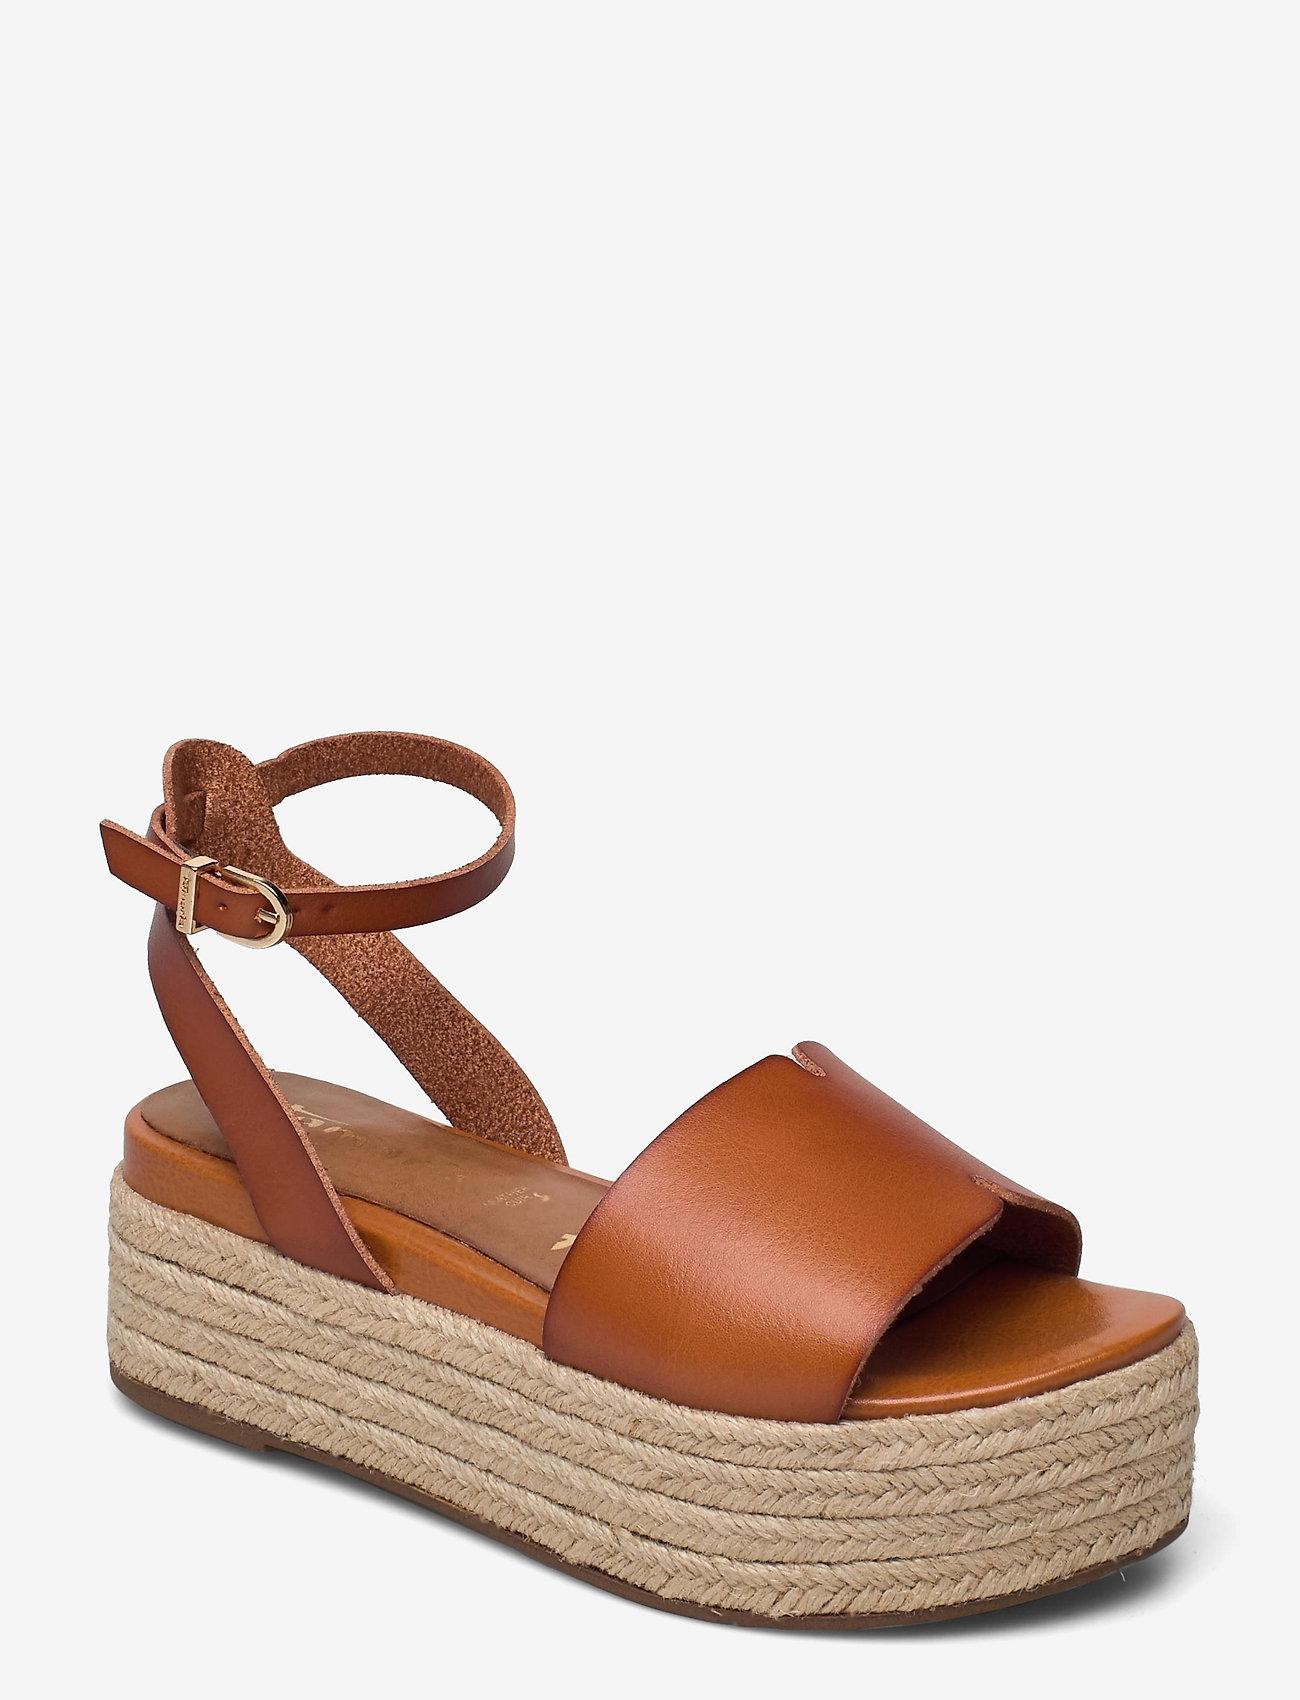 Tamaris - Woms Sandals - højhælede espadrillos - hazelnut - 1